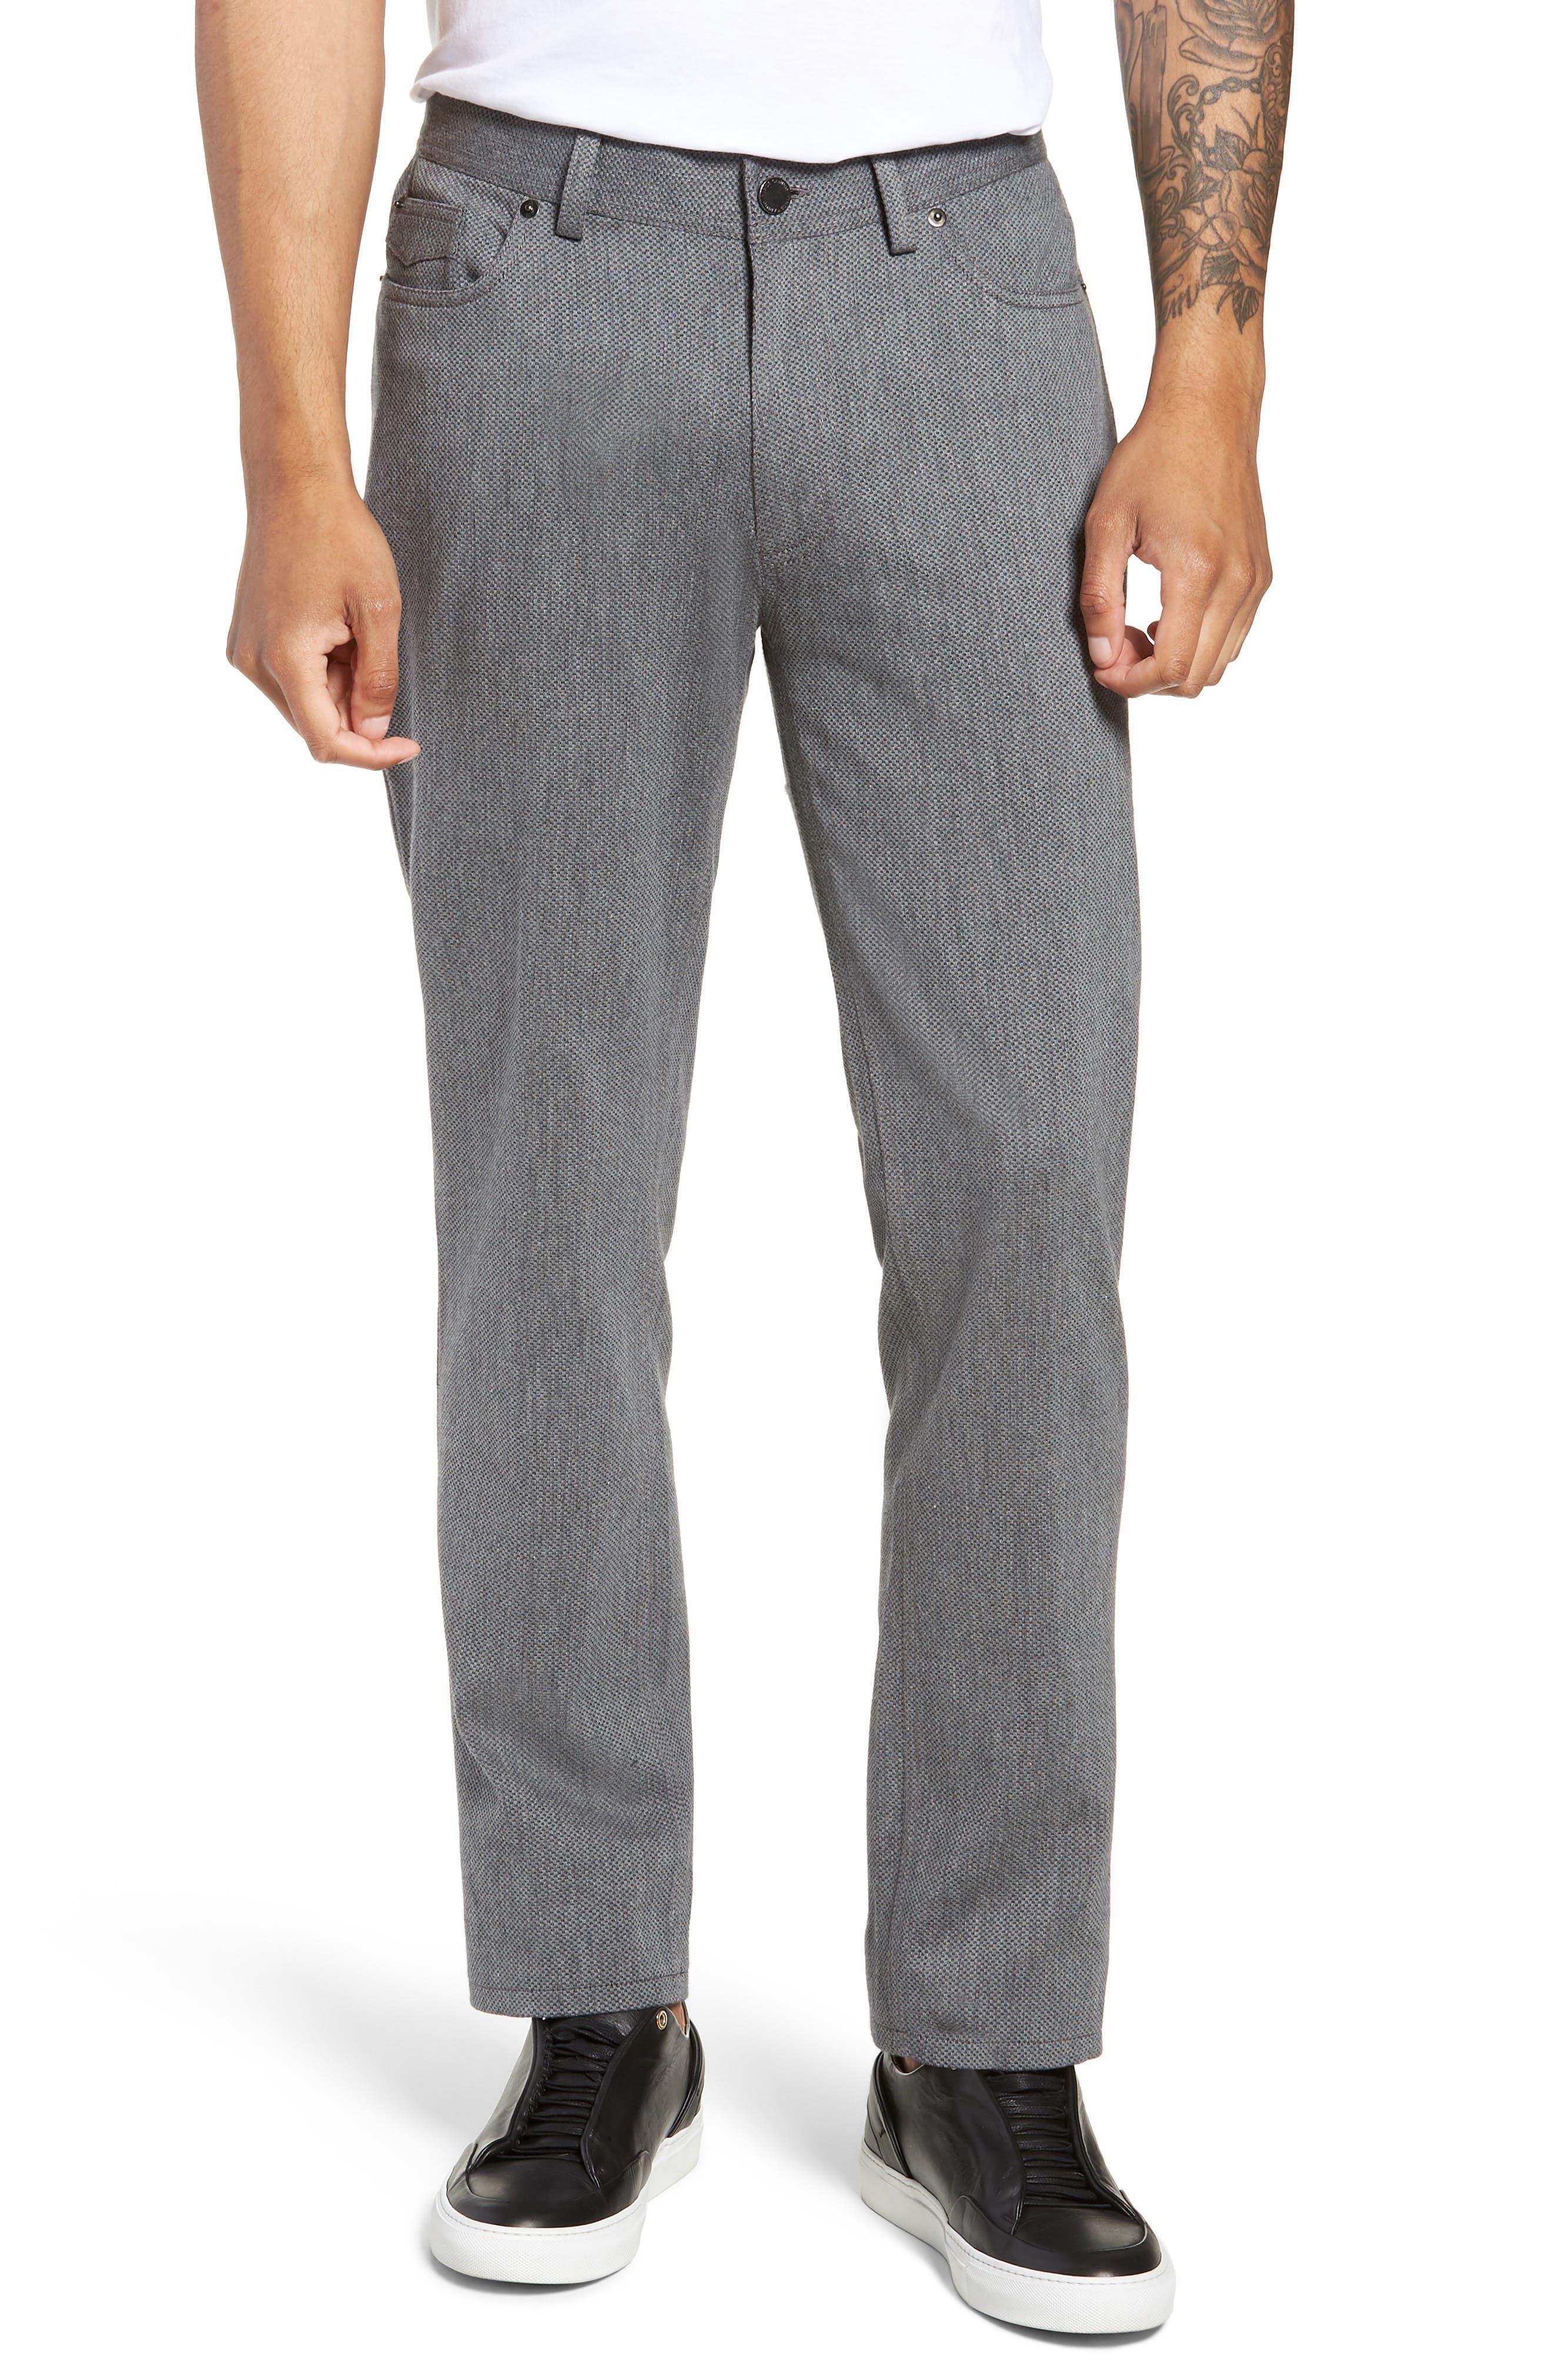 Straight Leg Five Pocket Stretch Pants,                             Main thumbnail 1, color,                             HEATHER CHARCOAL CROSSHATCH